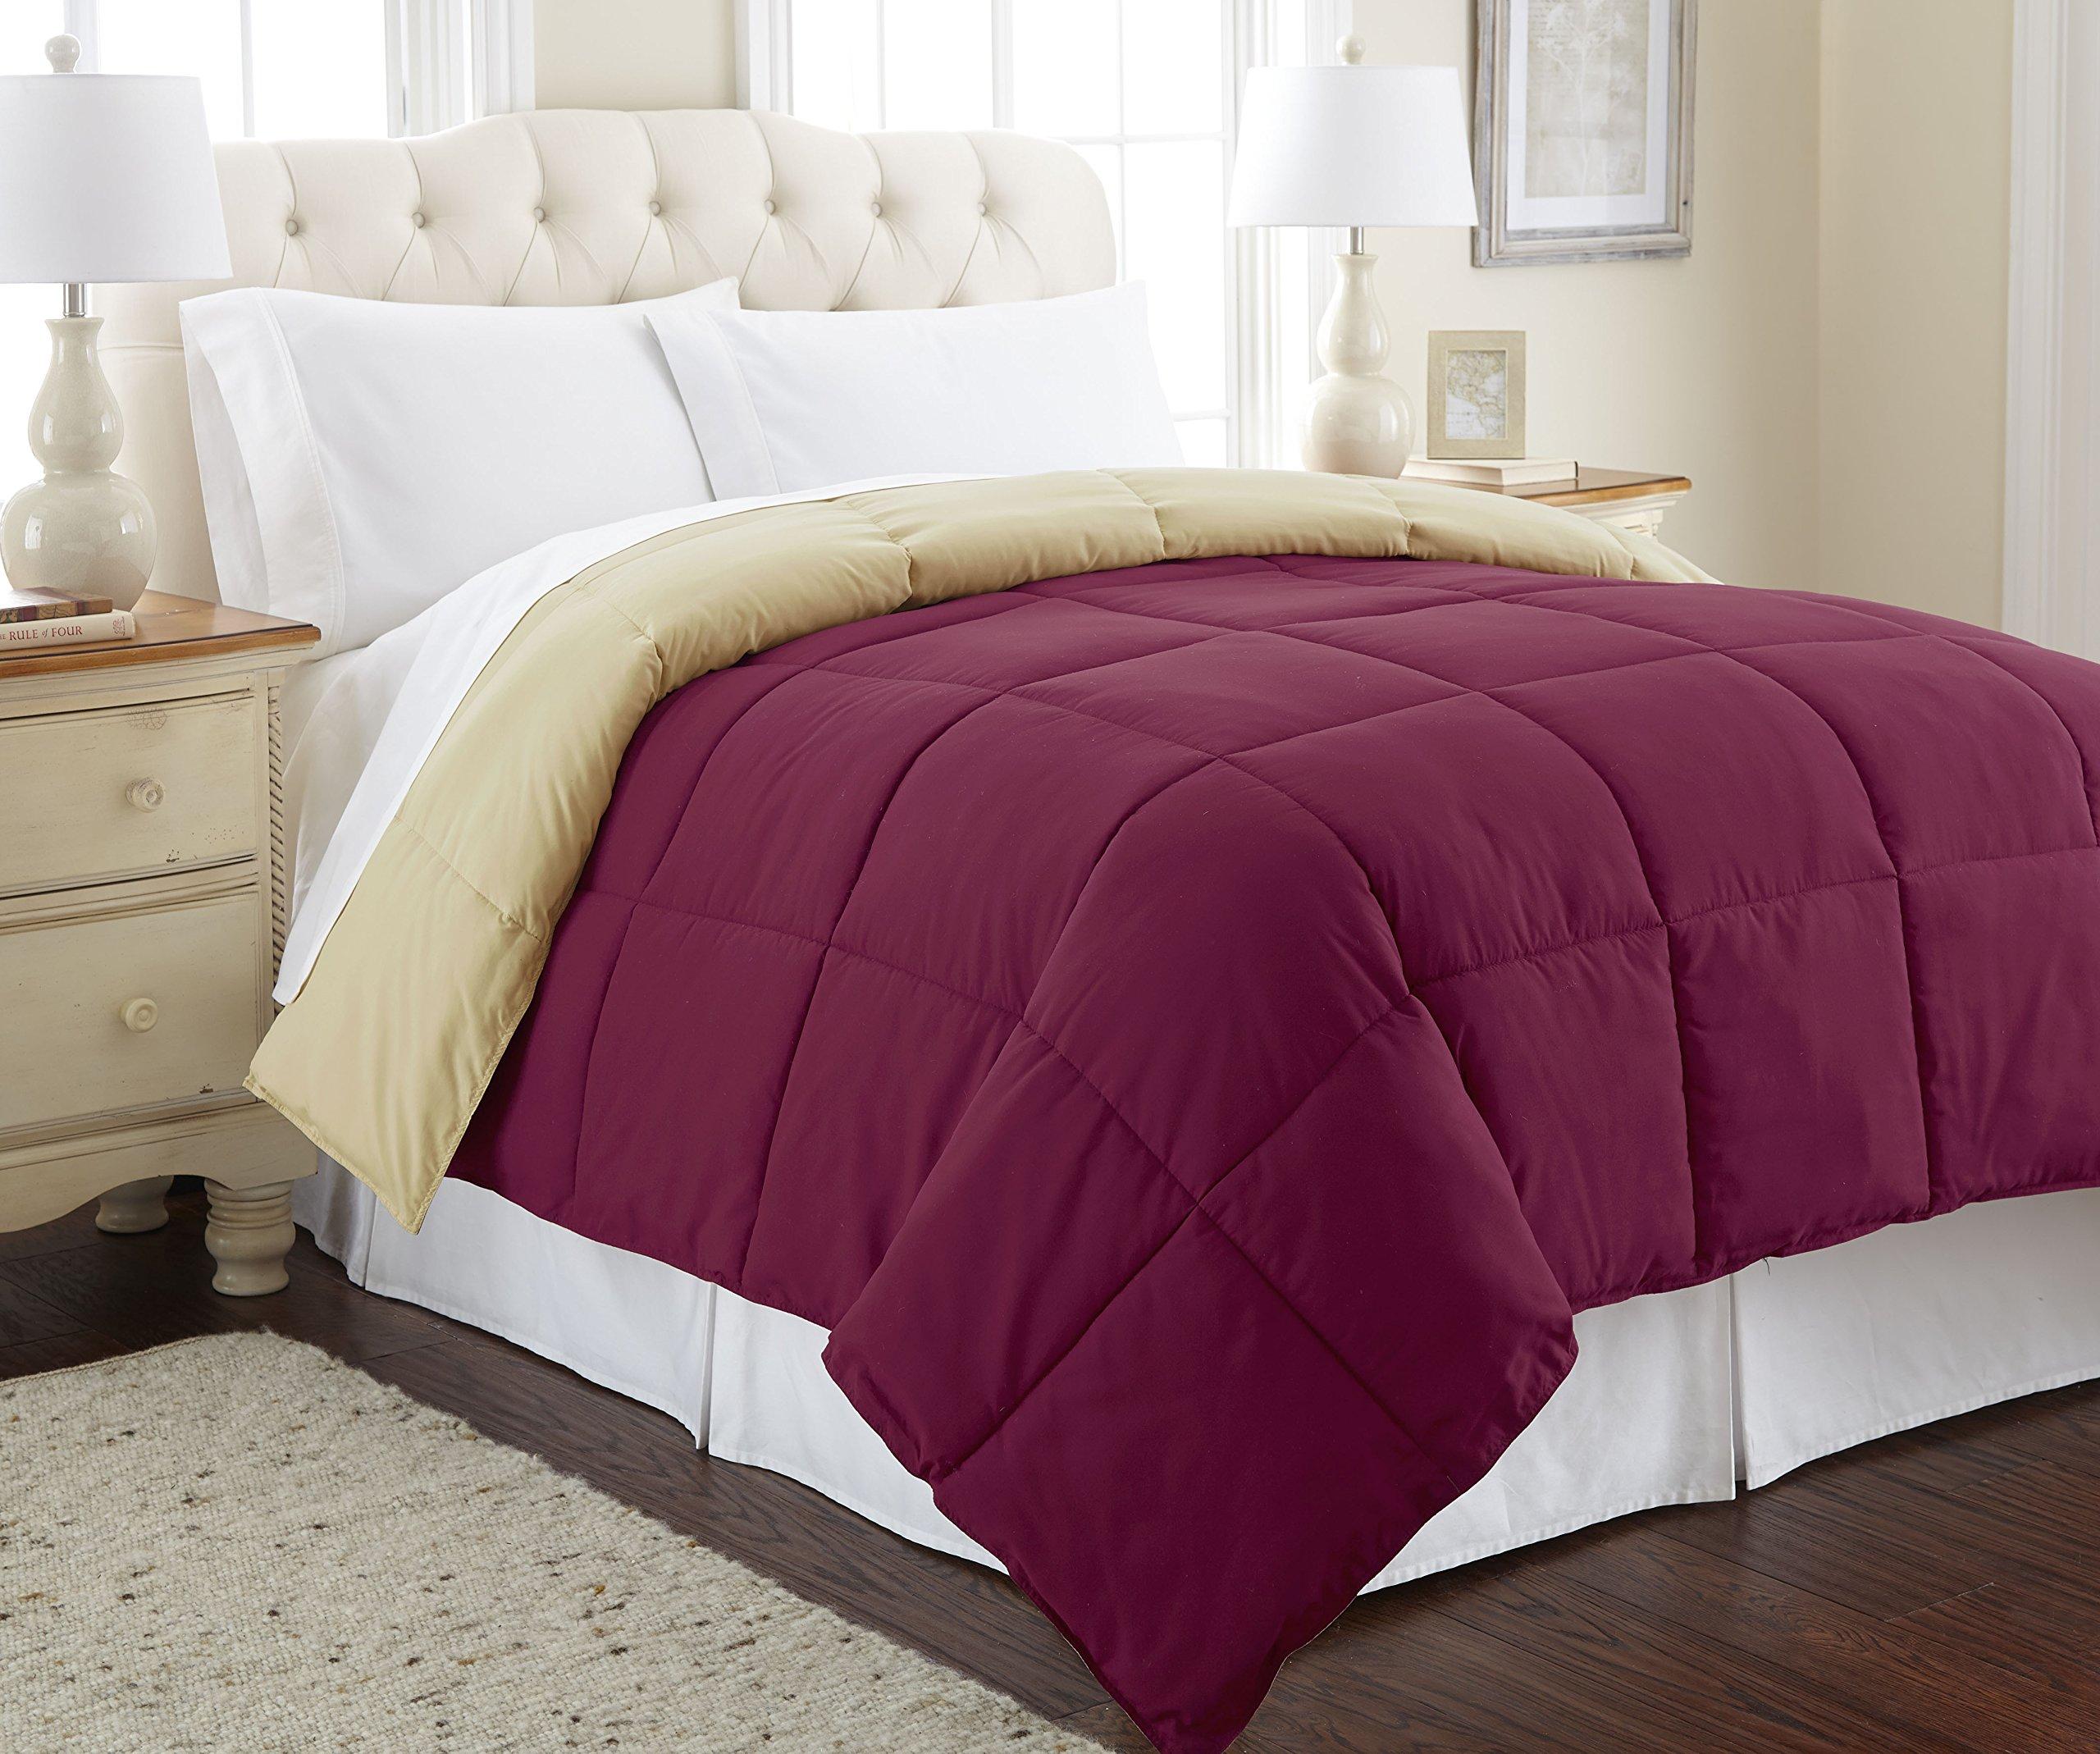 Amrapur Overseas | Goose Down Alternative Microfiber Quilted Reversible Comforter/Duvet Insert - Ultra Soft Hypoallergenic Bedding - Medium Warmth for All Seasons - [Queen, Anemone/Wheat]